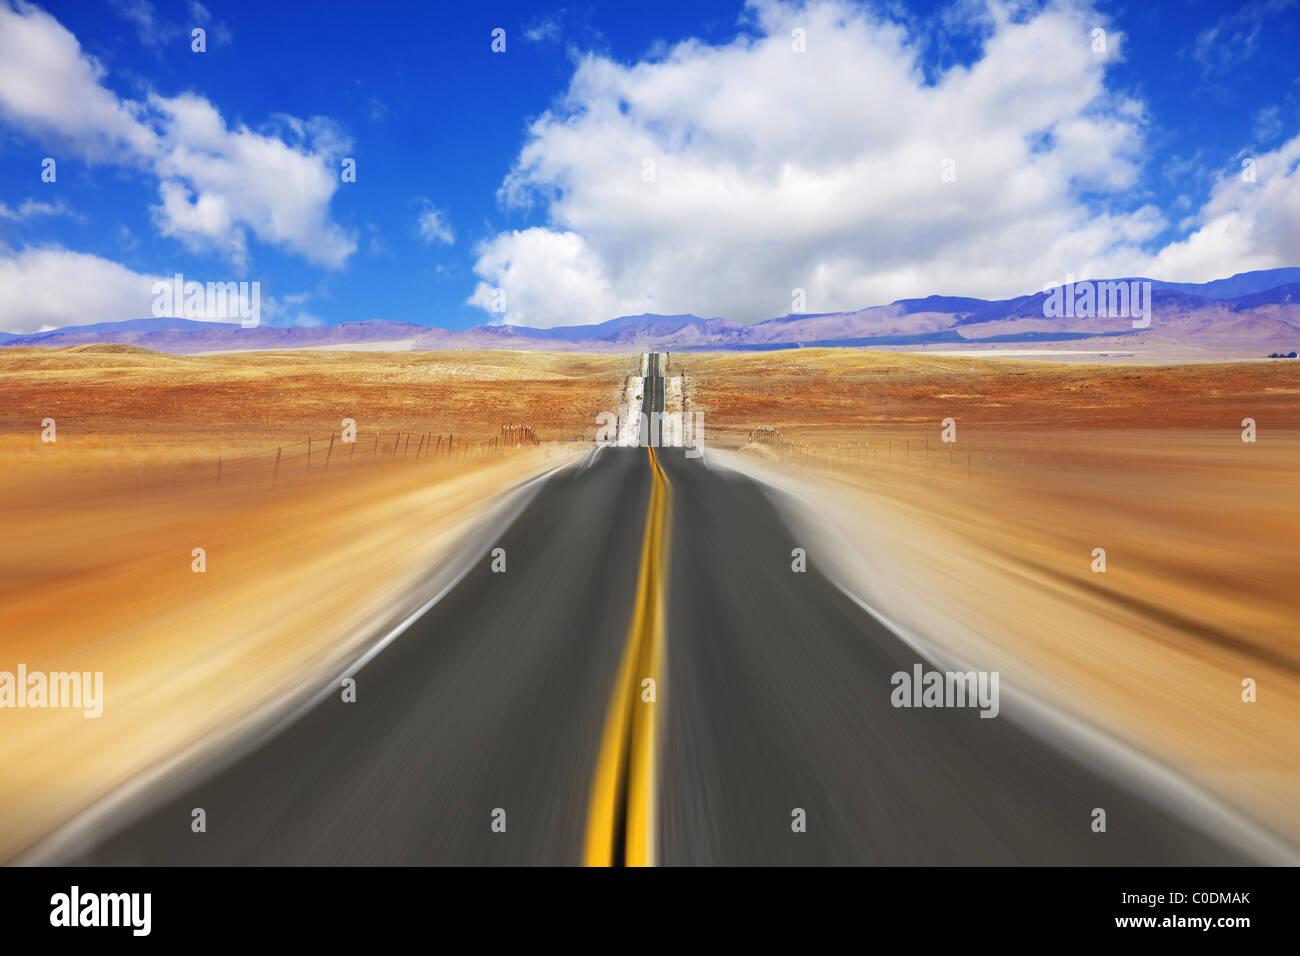 Mirage on high speed in desert Stock Photo